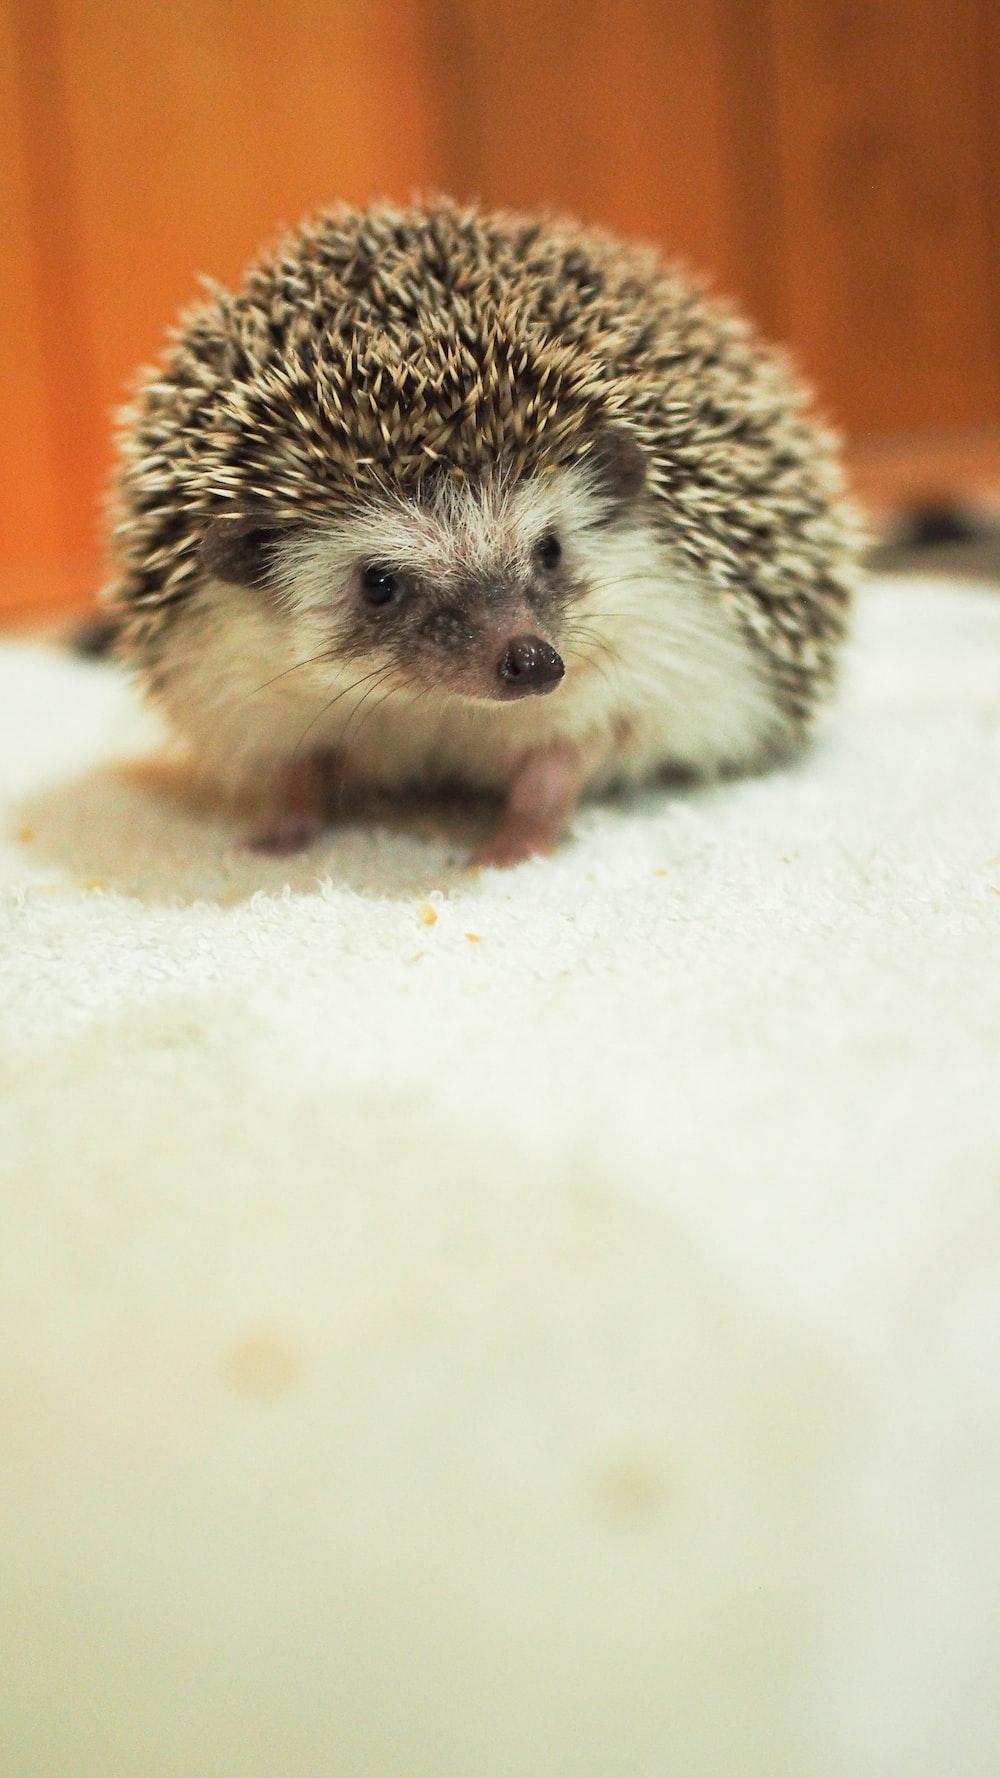 hedgehog on white sand during daytime